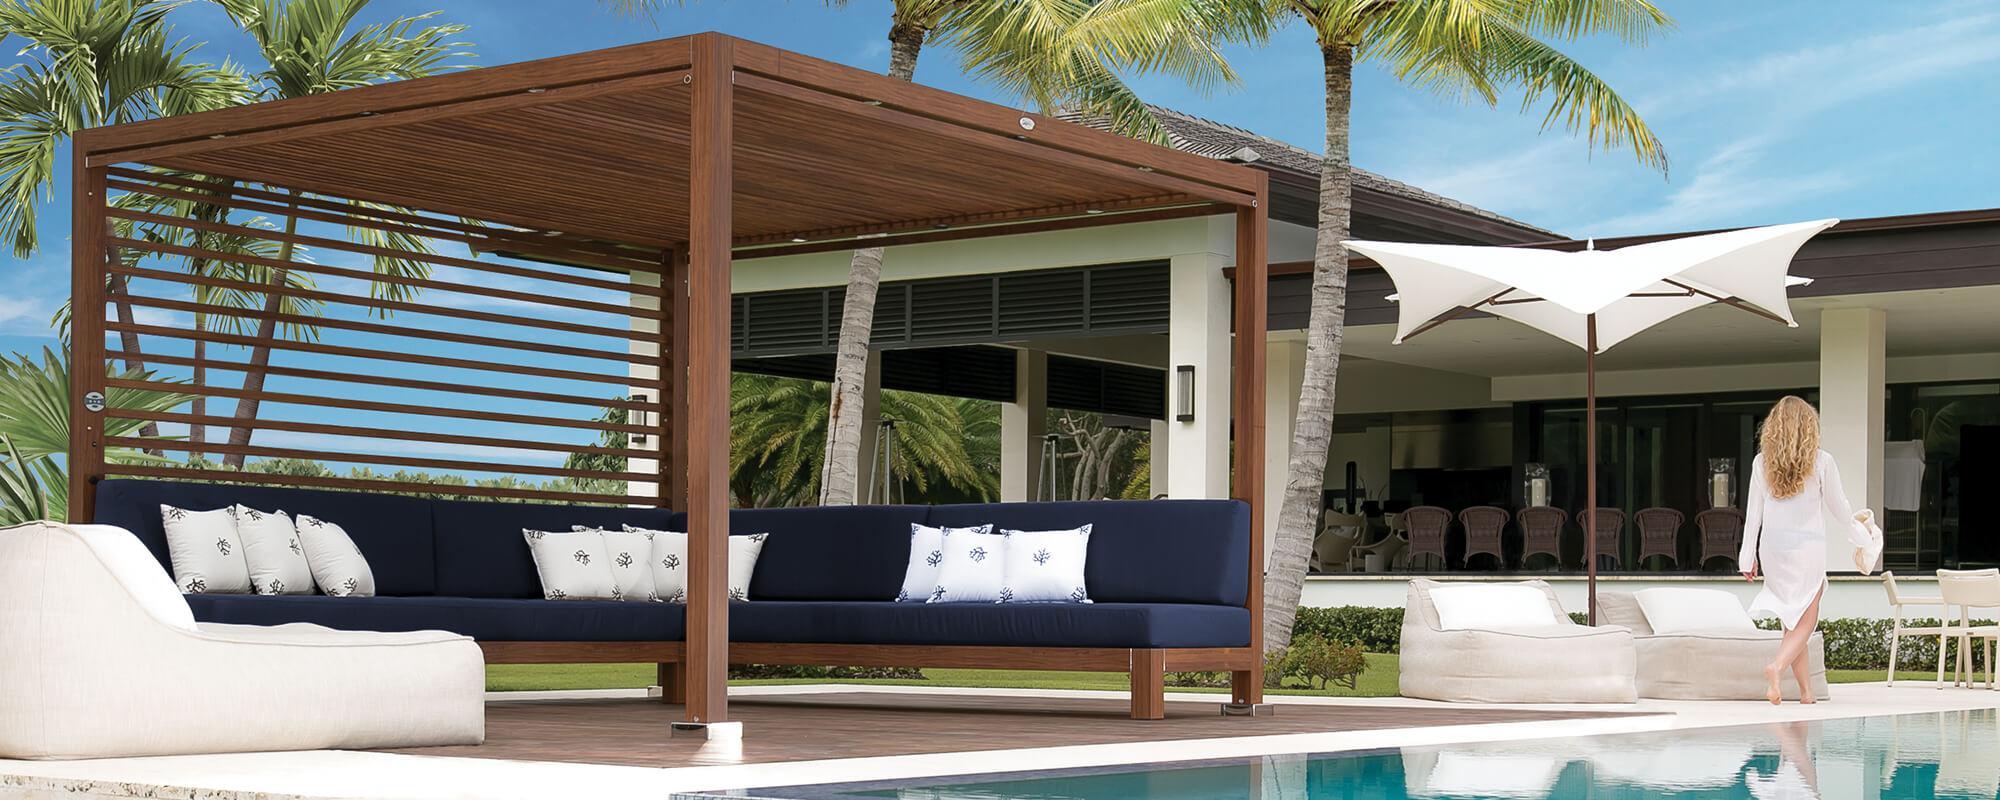 Magnificent 50 Outdoor Cabana Design Ideas Of Best 25